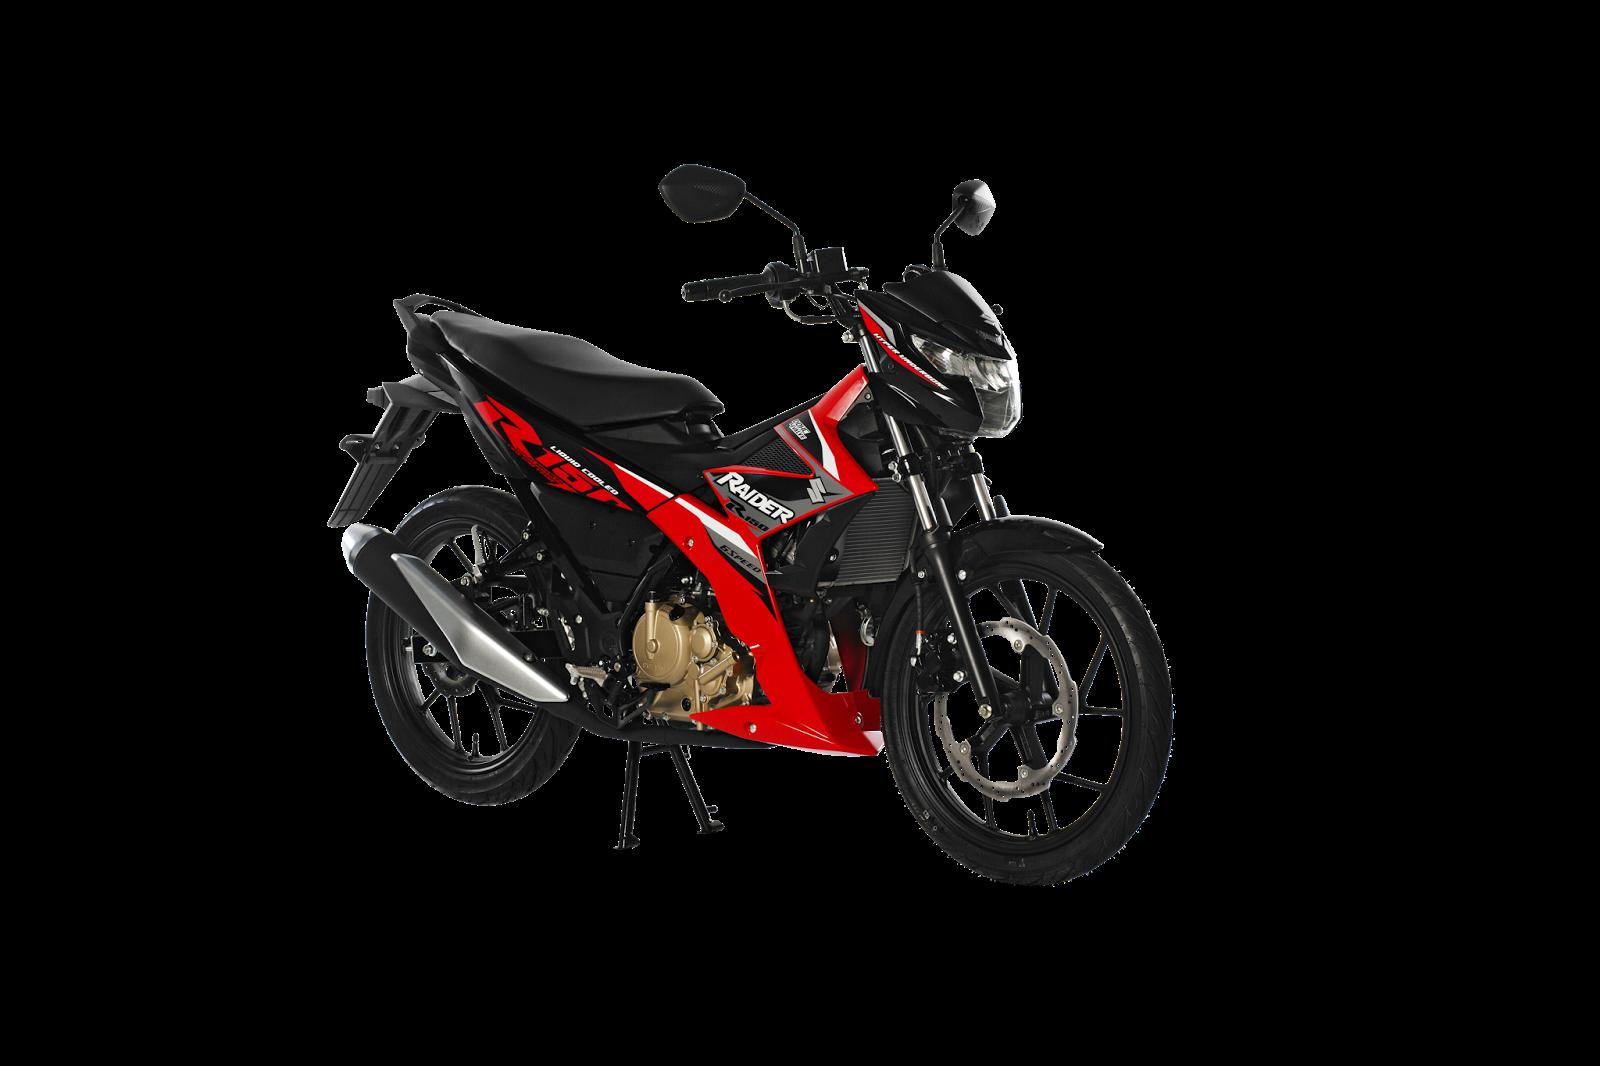 Suzuki Raider R150 Fi Full Specifications And Price Motoph